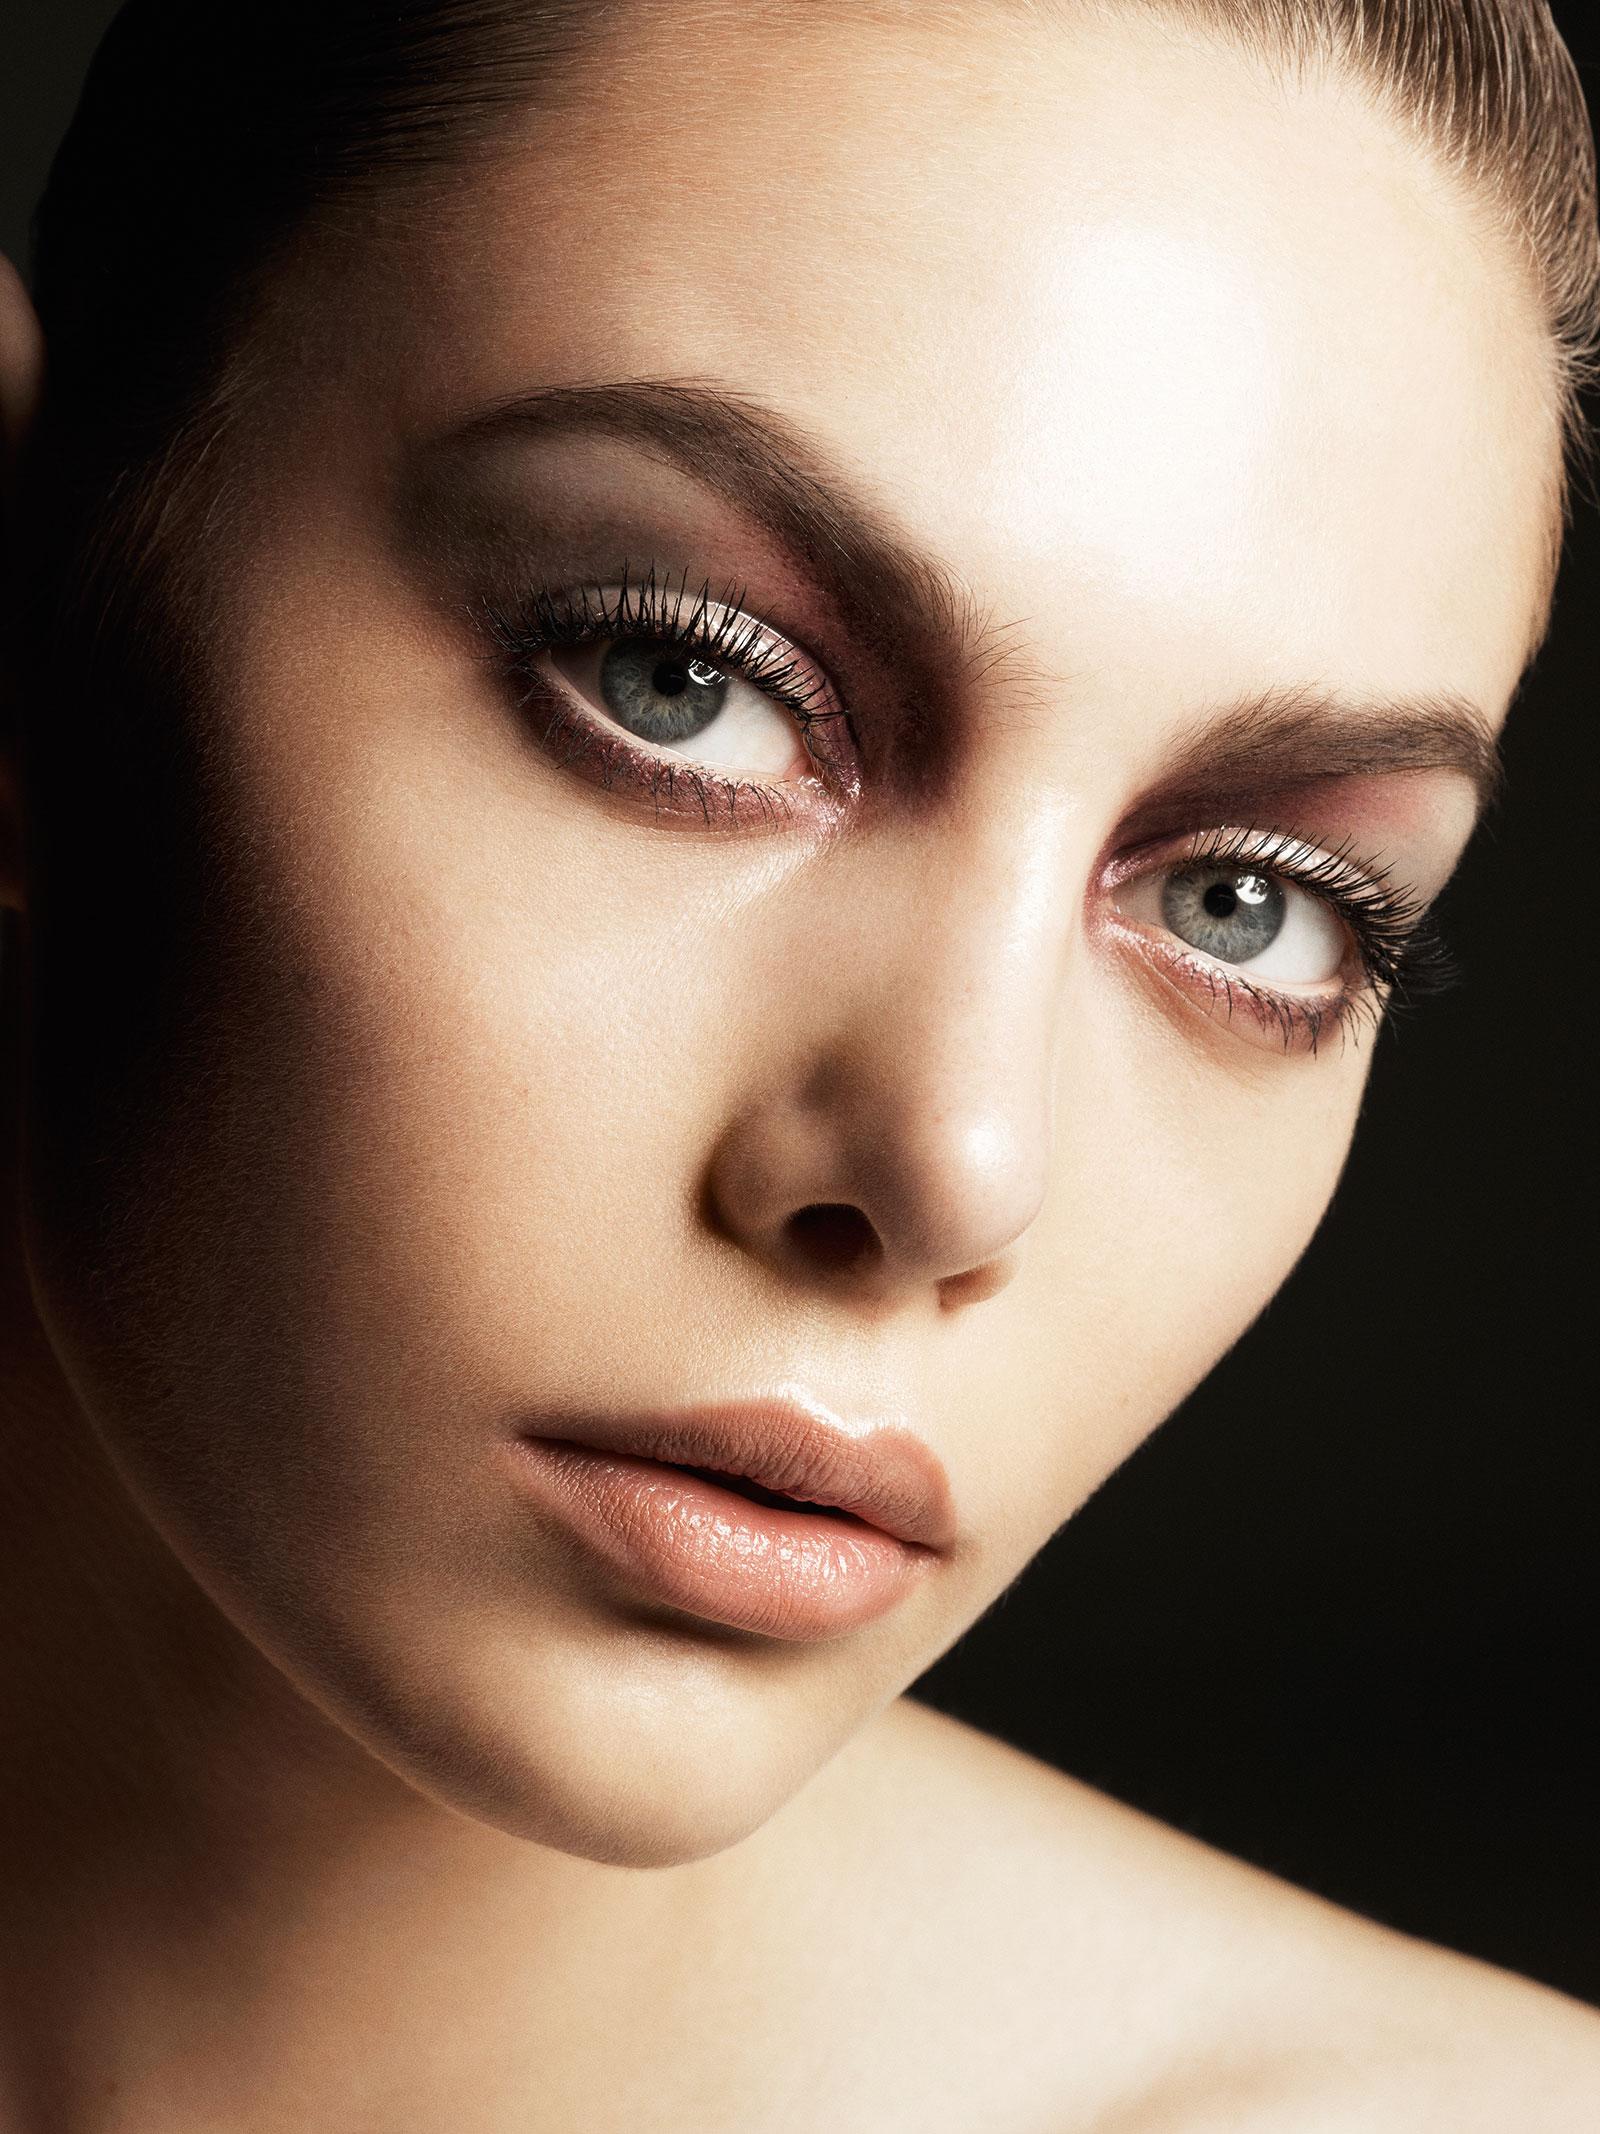 Victoria Beckham x Estee Lauder London Look (2)